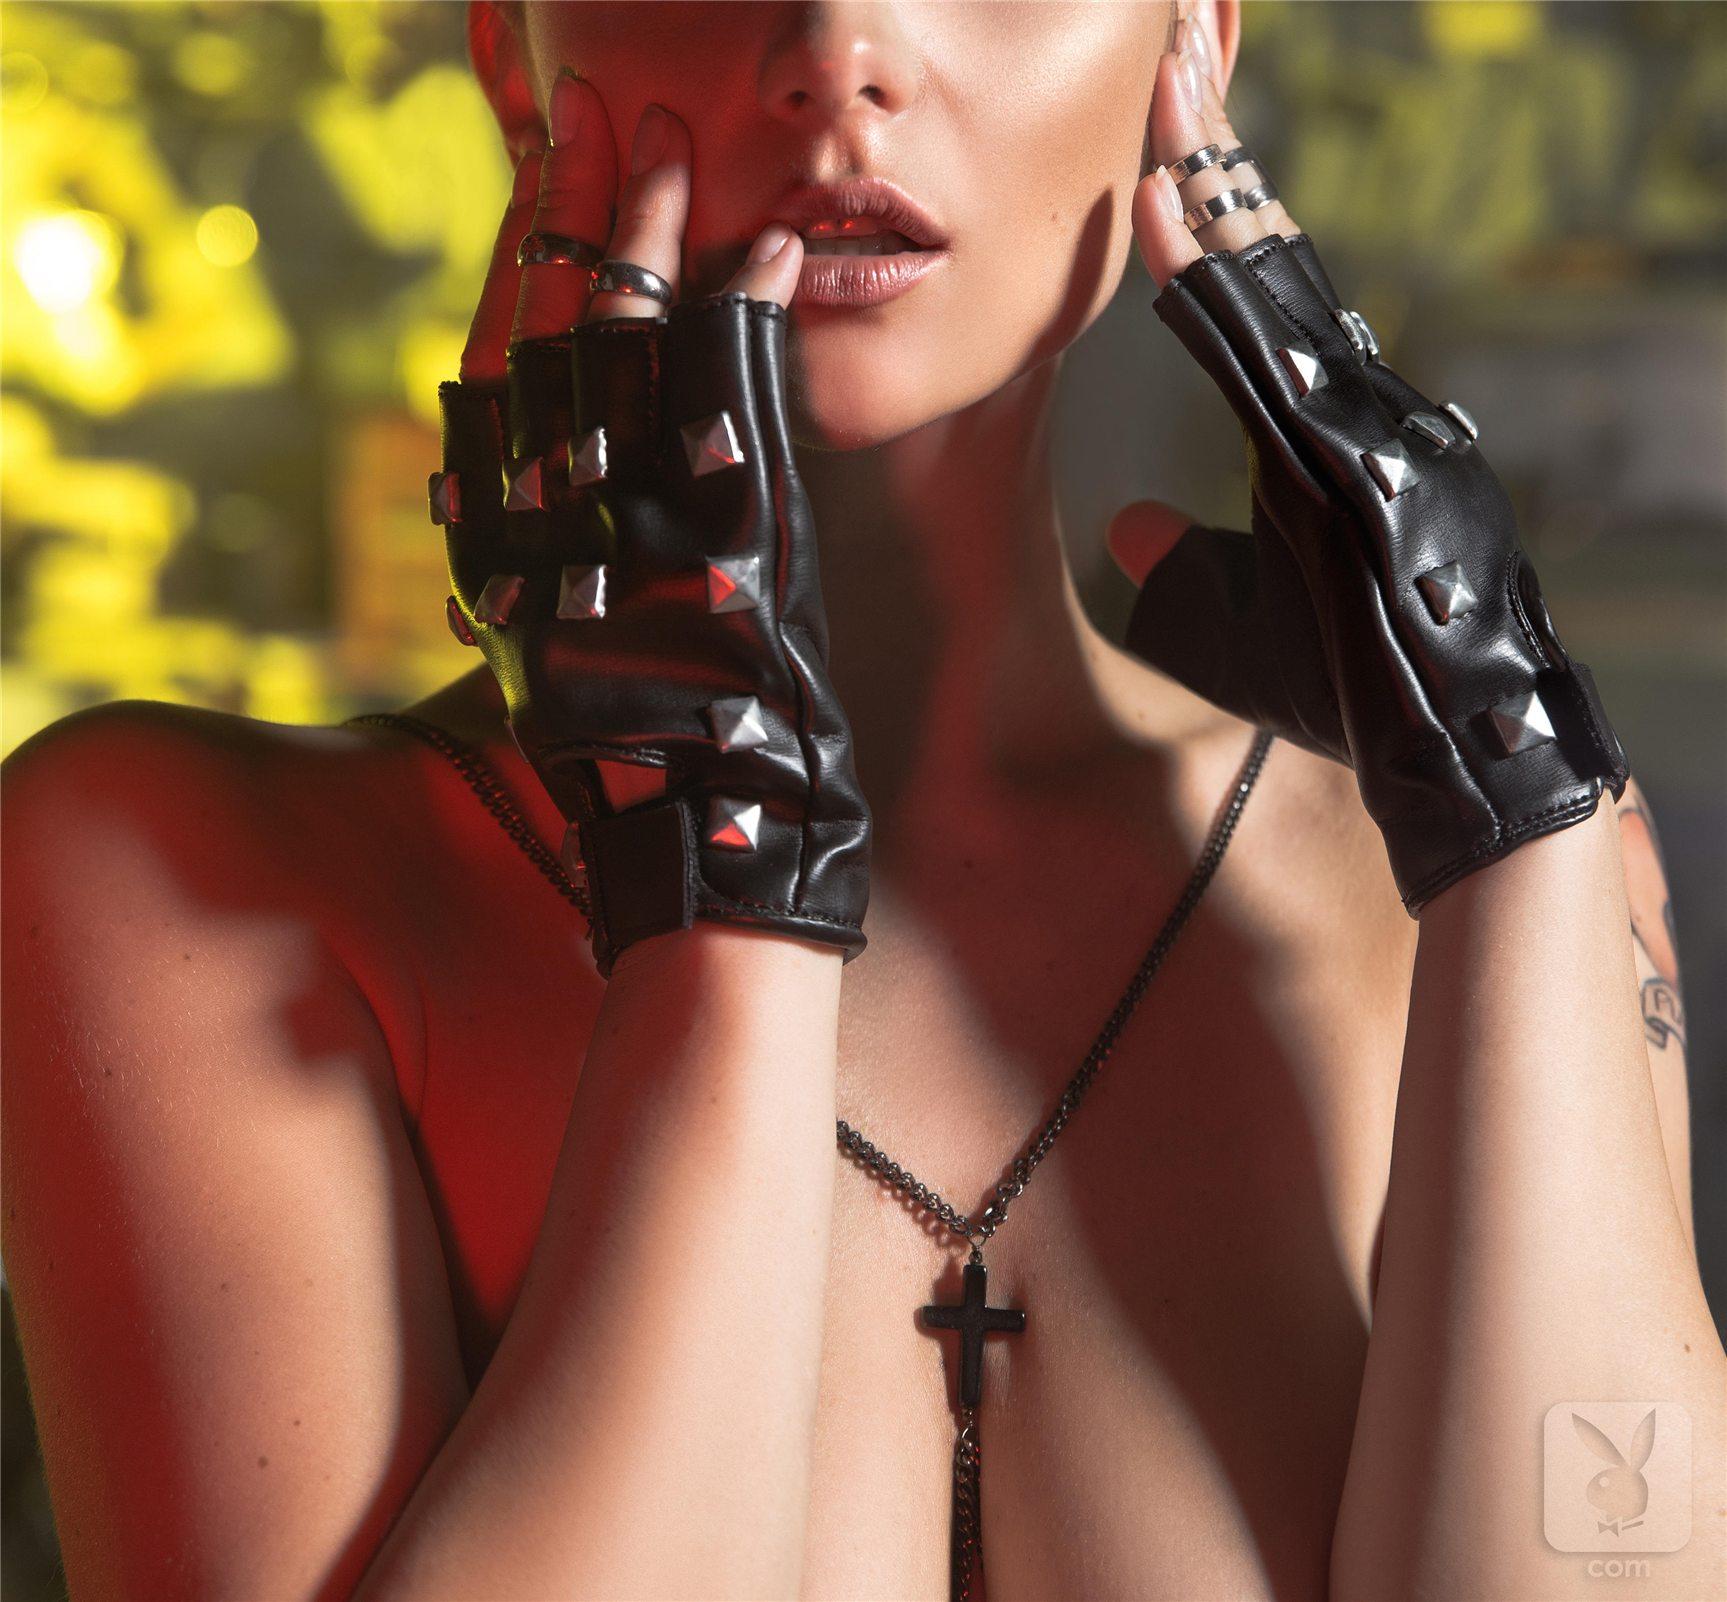 Ангелы Анархии - Евгения Диордийчук / Yevgeniya Diordiychuk, Katie Carroll and Jade Bryce - Angels of Anarchy by Playboy